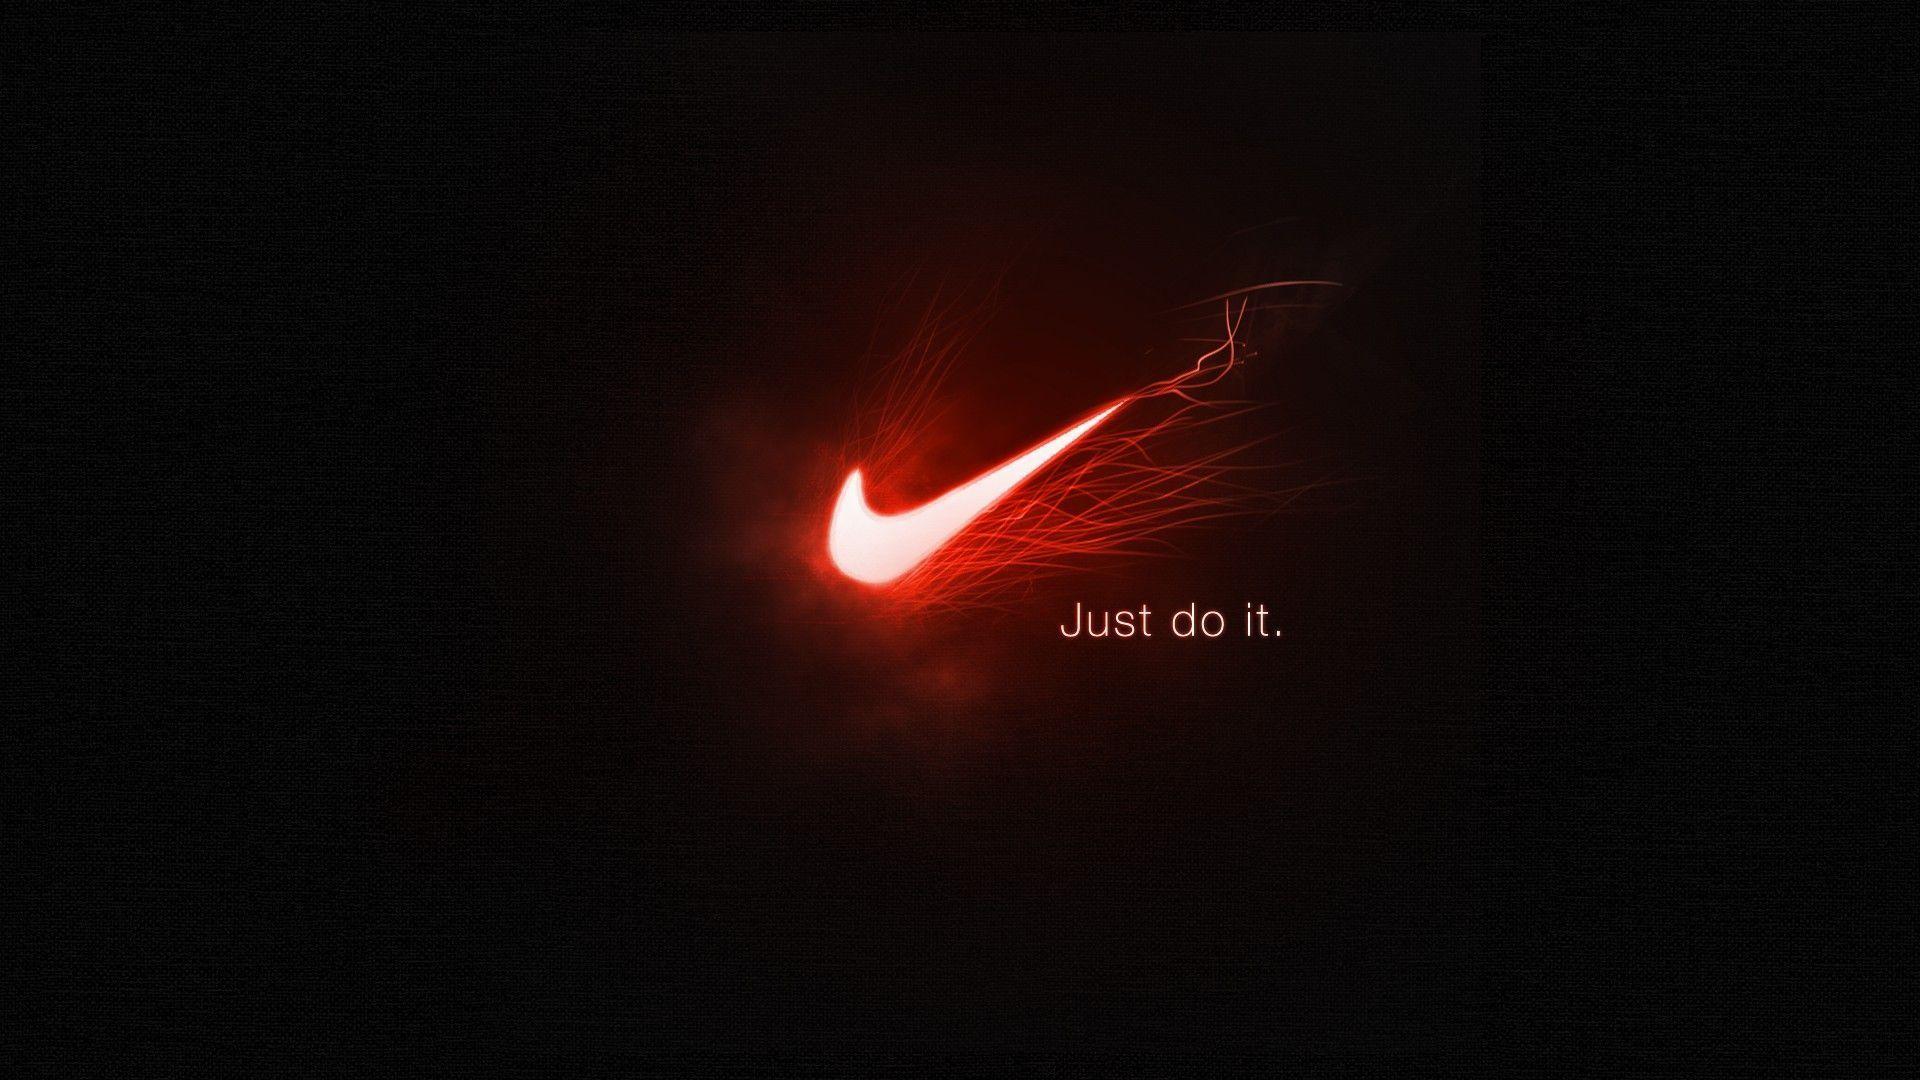 Desktop-Download-Black-Nike-Iphone-Backgrounds